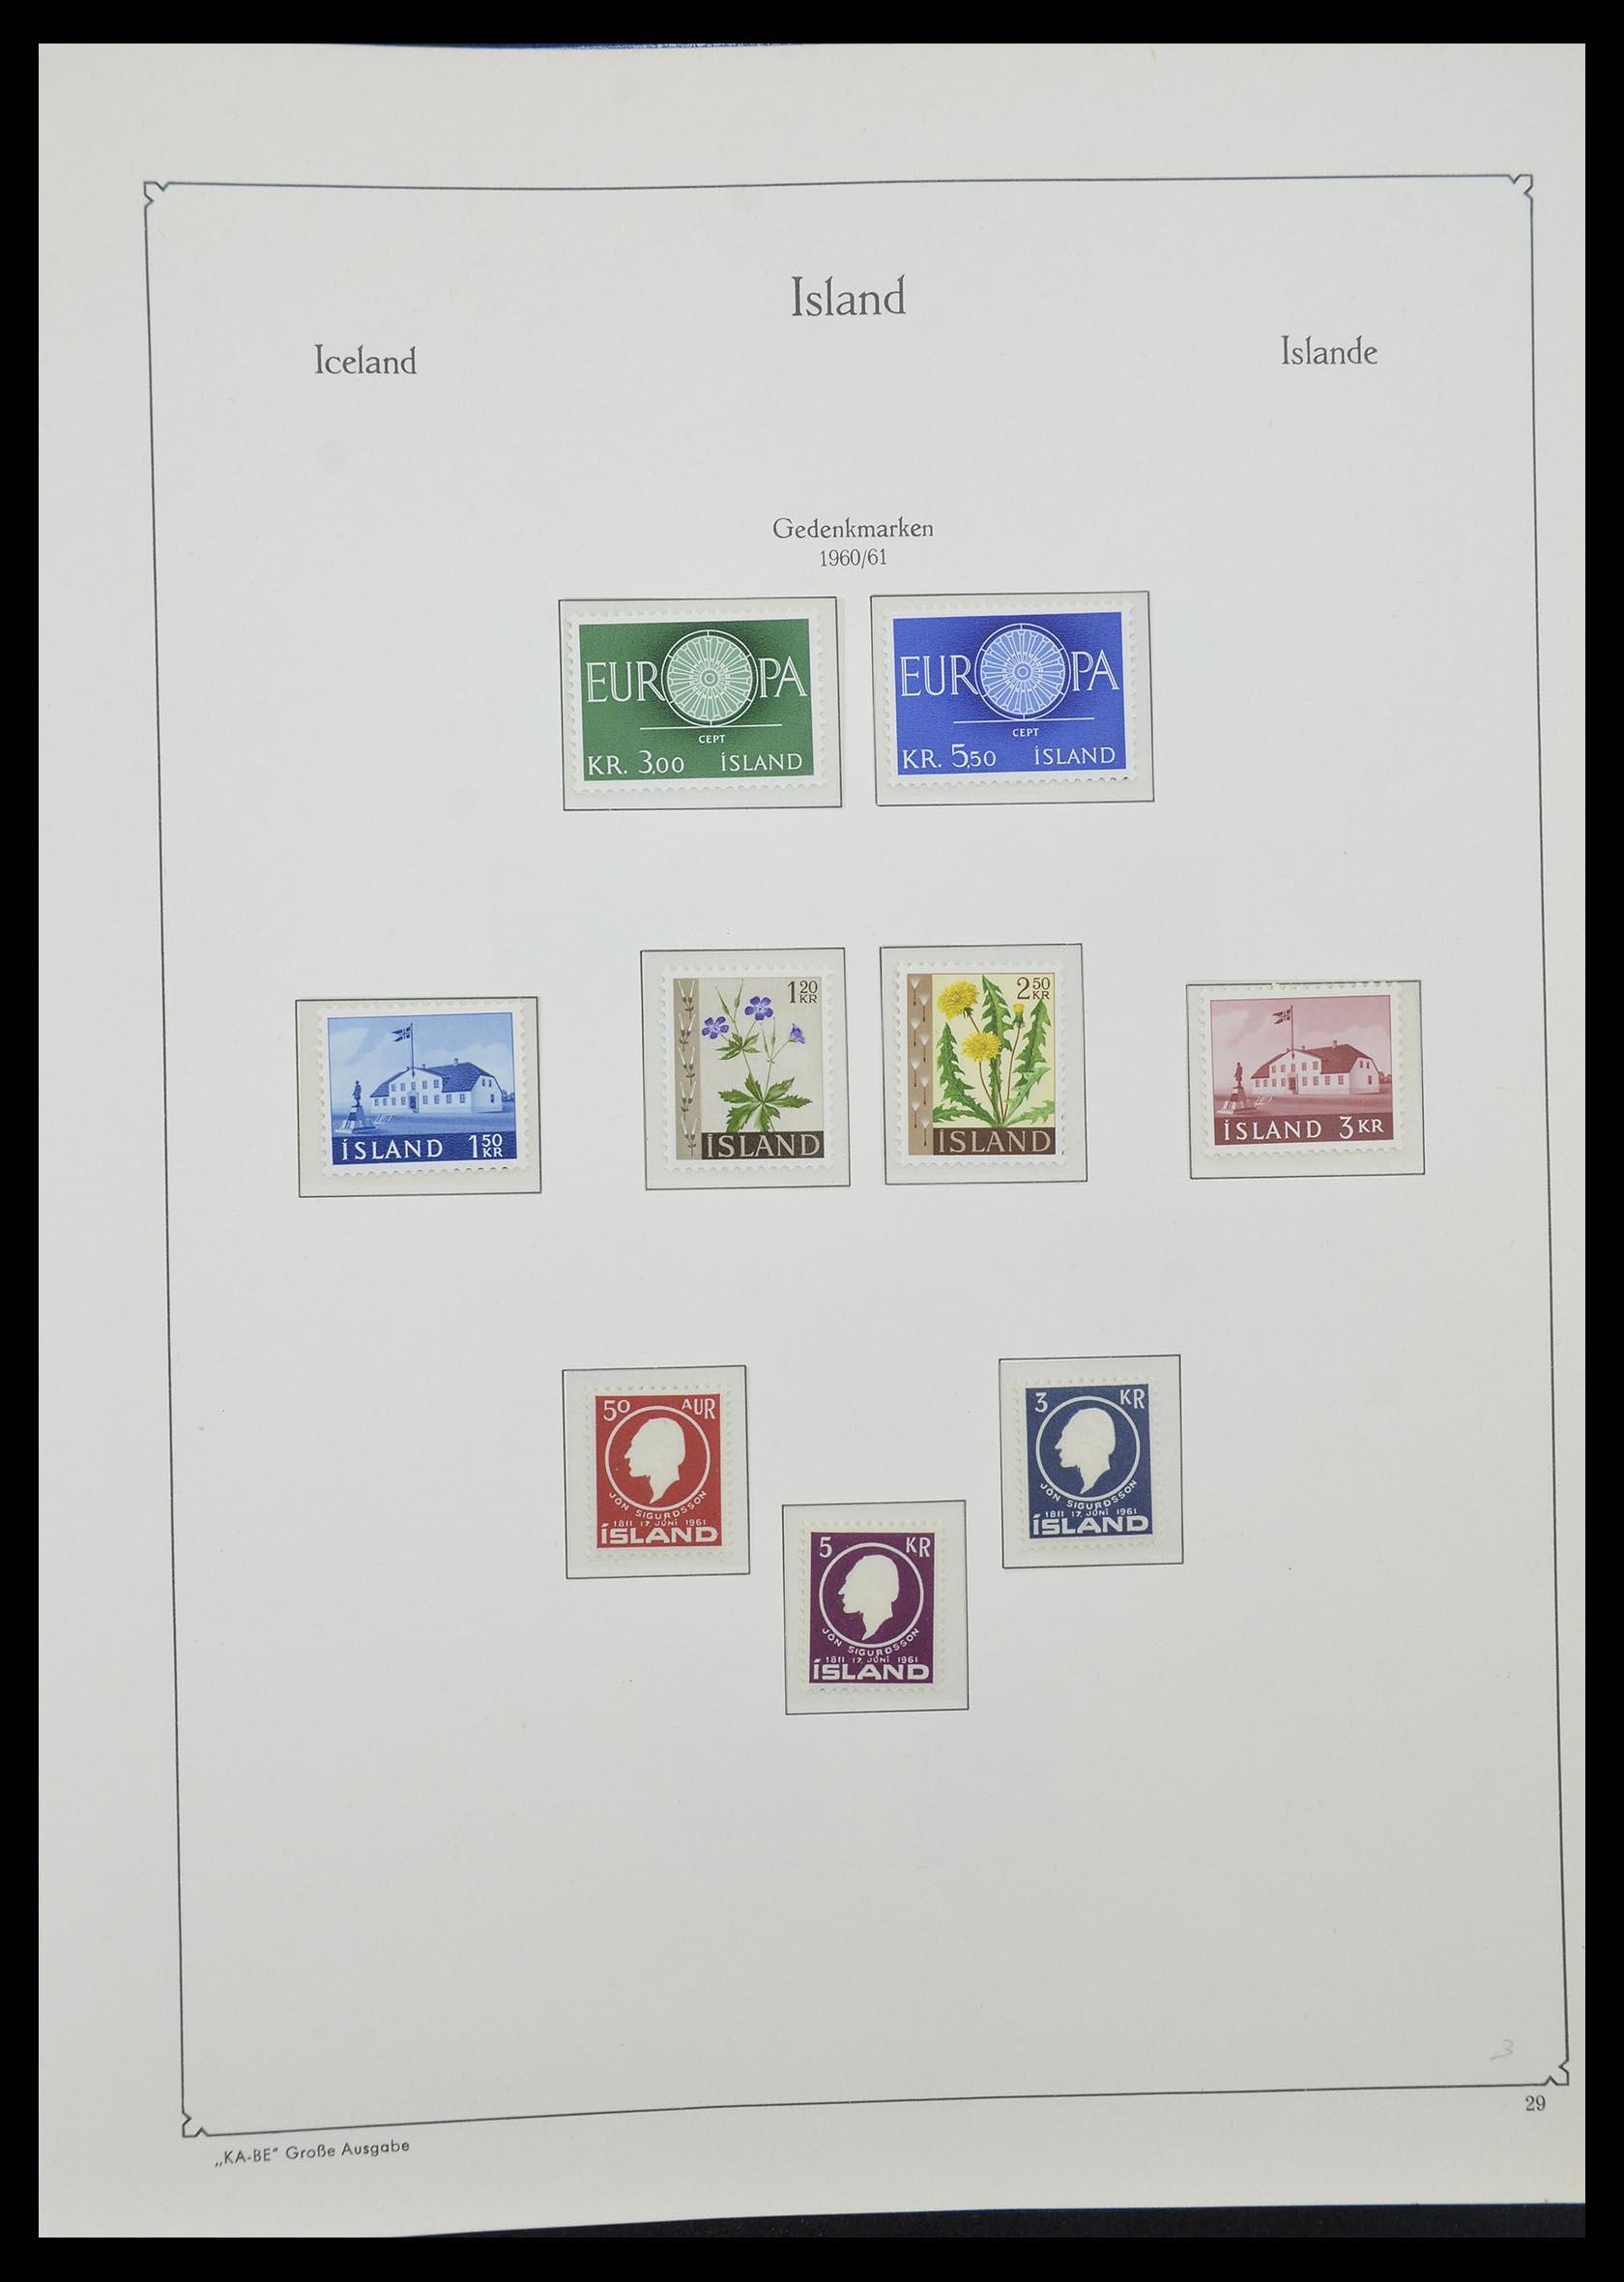 33185 012 - Postzegelverzameling 33184 Finland 1856-1990.